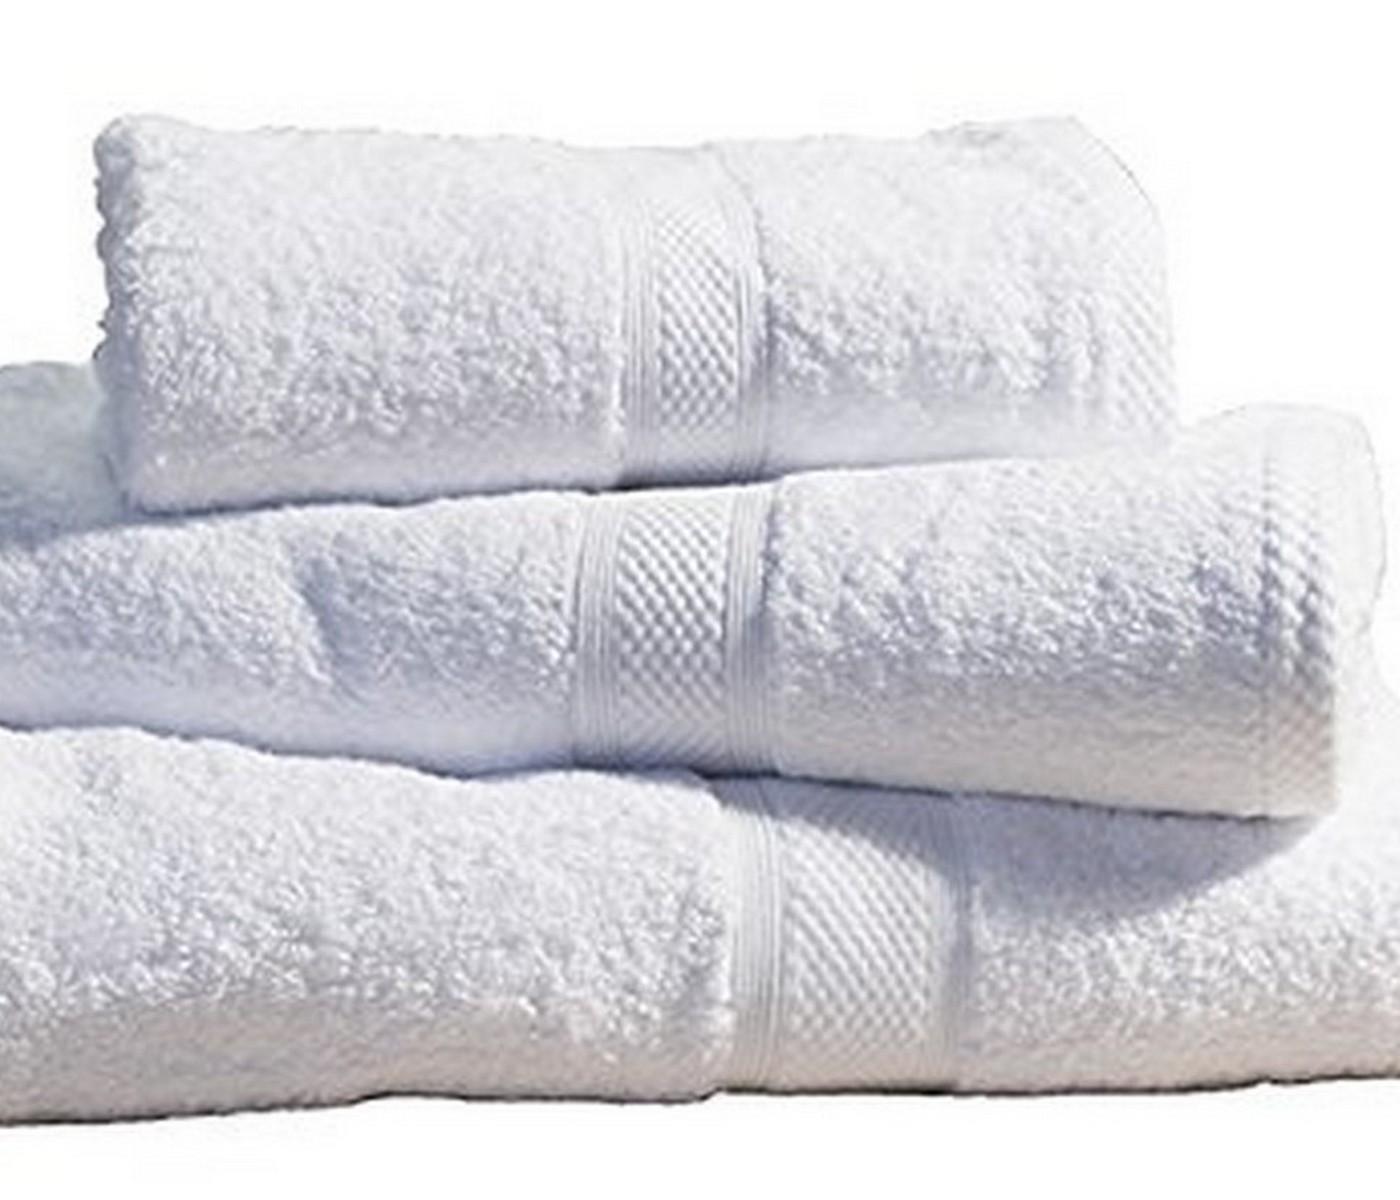 10 X LUXURY STRIPED HOTEL QUALITY 100/% EGYPTIAN COTTON WHITE BATH TOWEL 600GSM